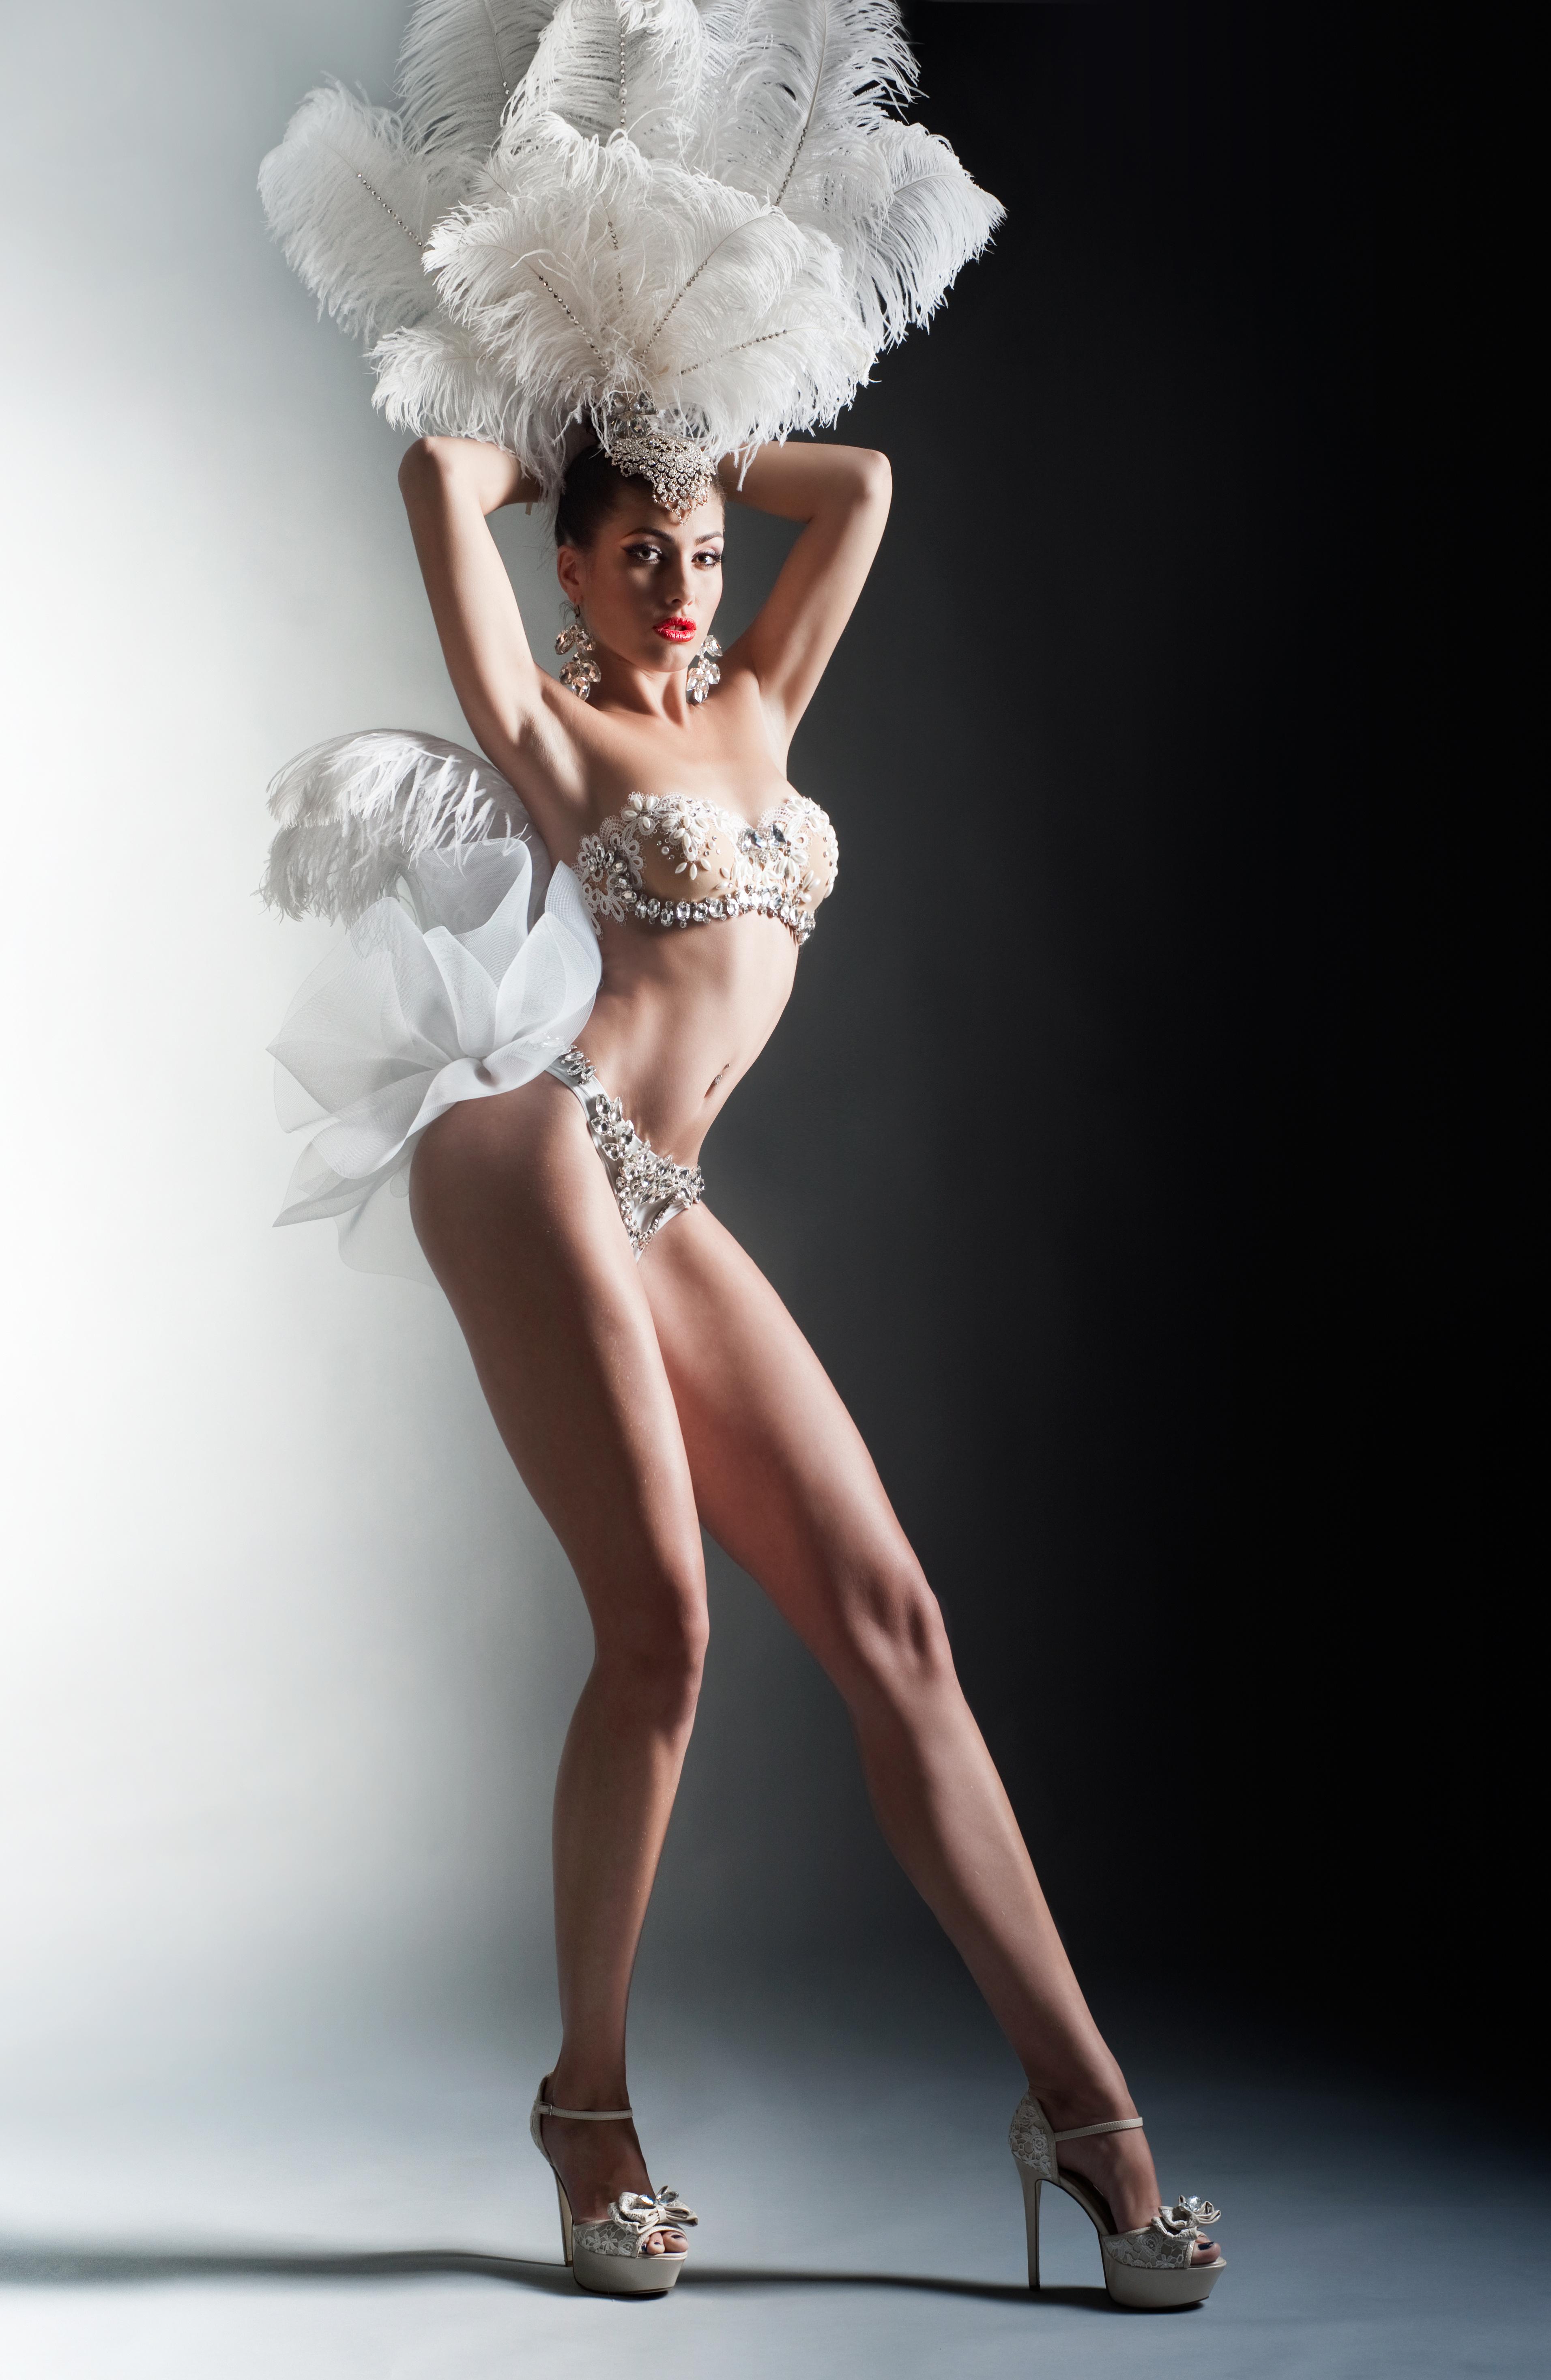 Dasee garl xx photo sexual gallery